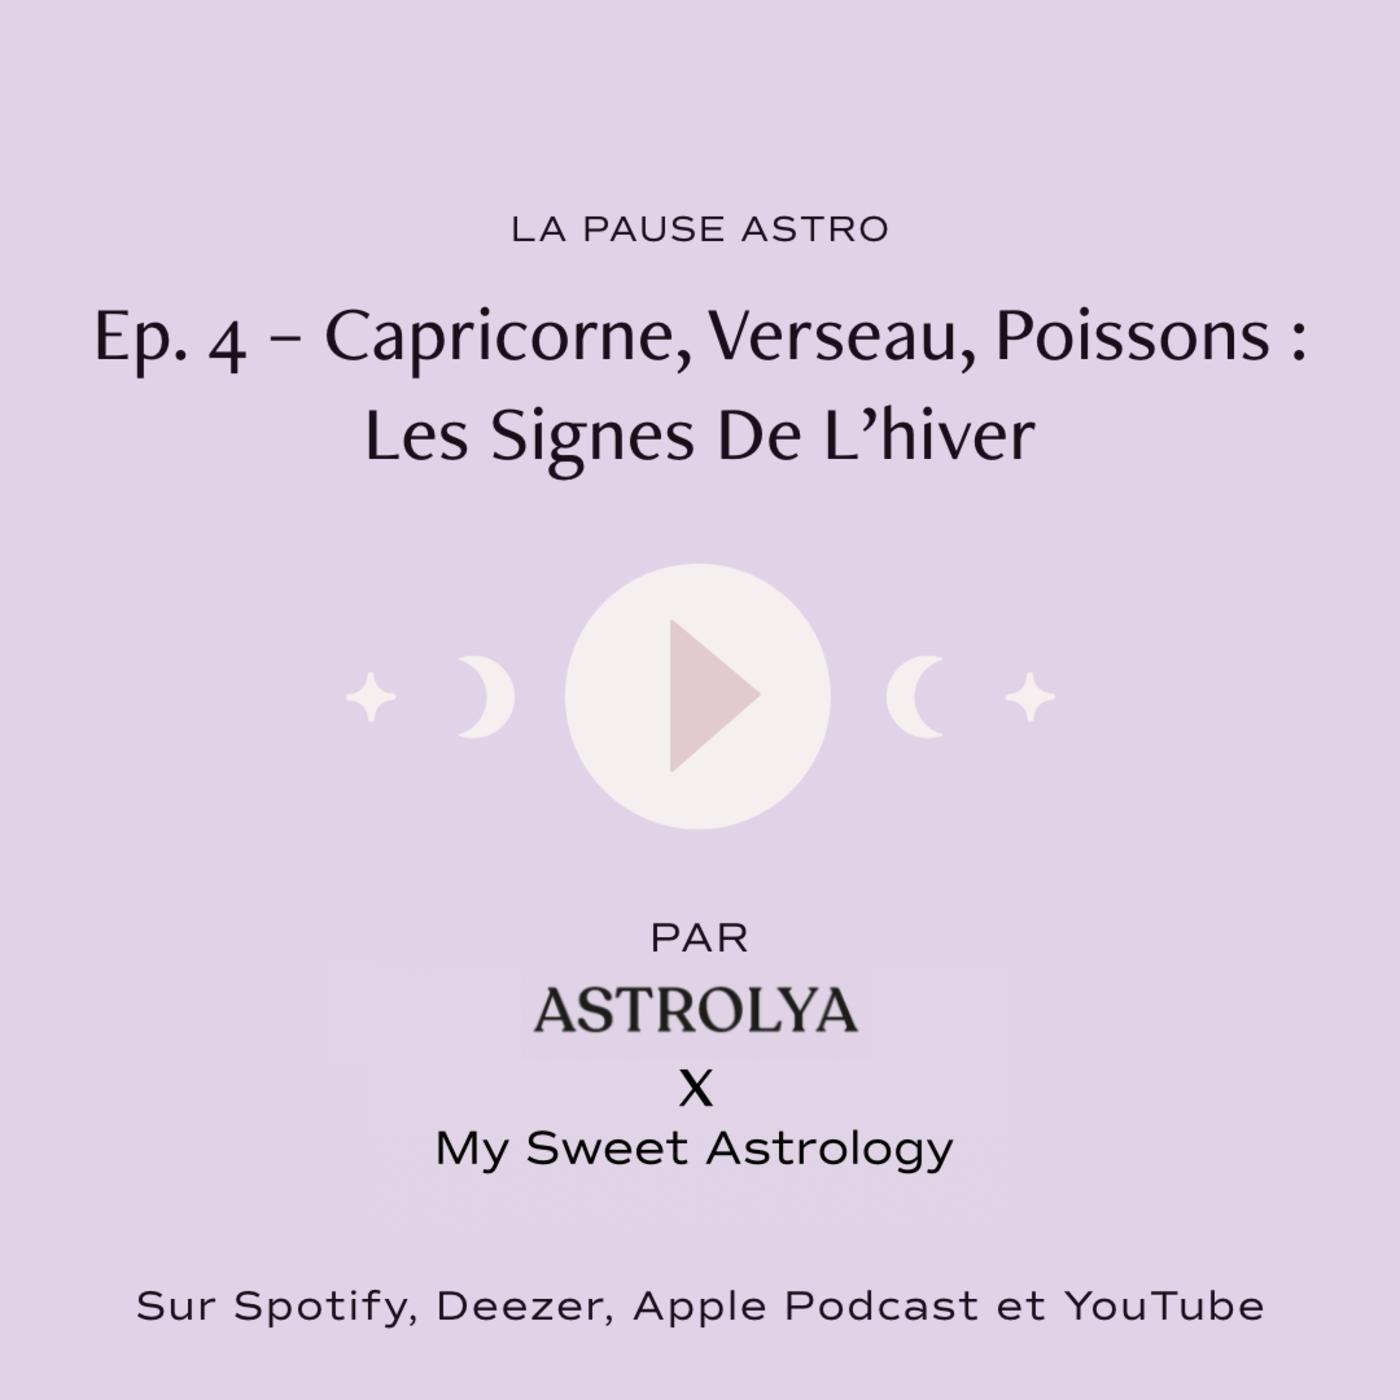 #LPA : Capricorne, Verseau, Poissons